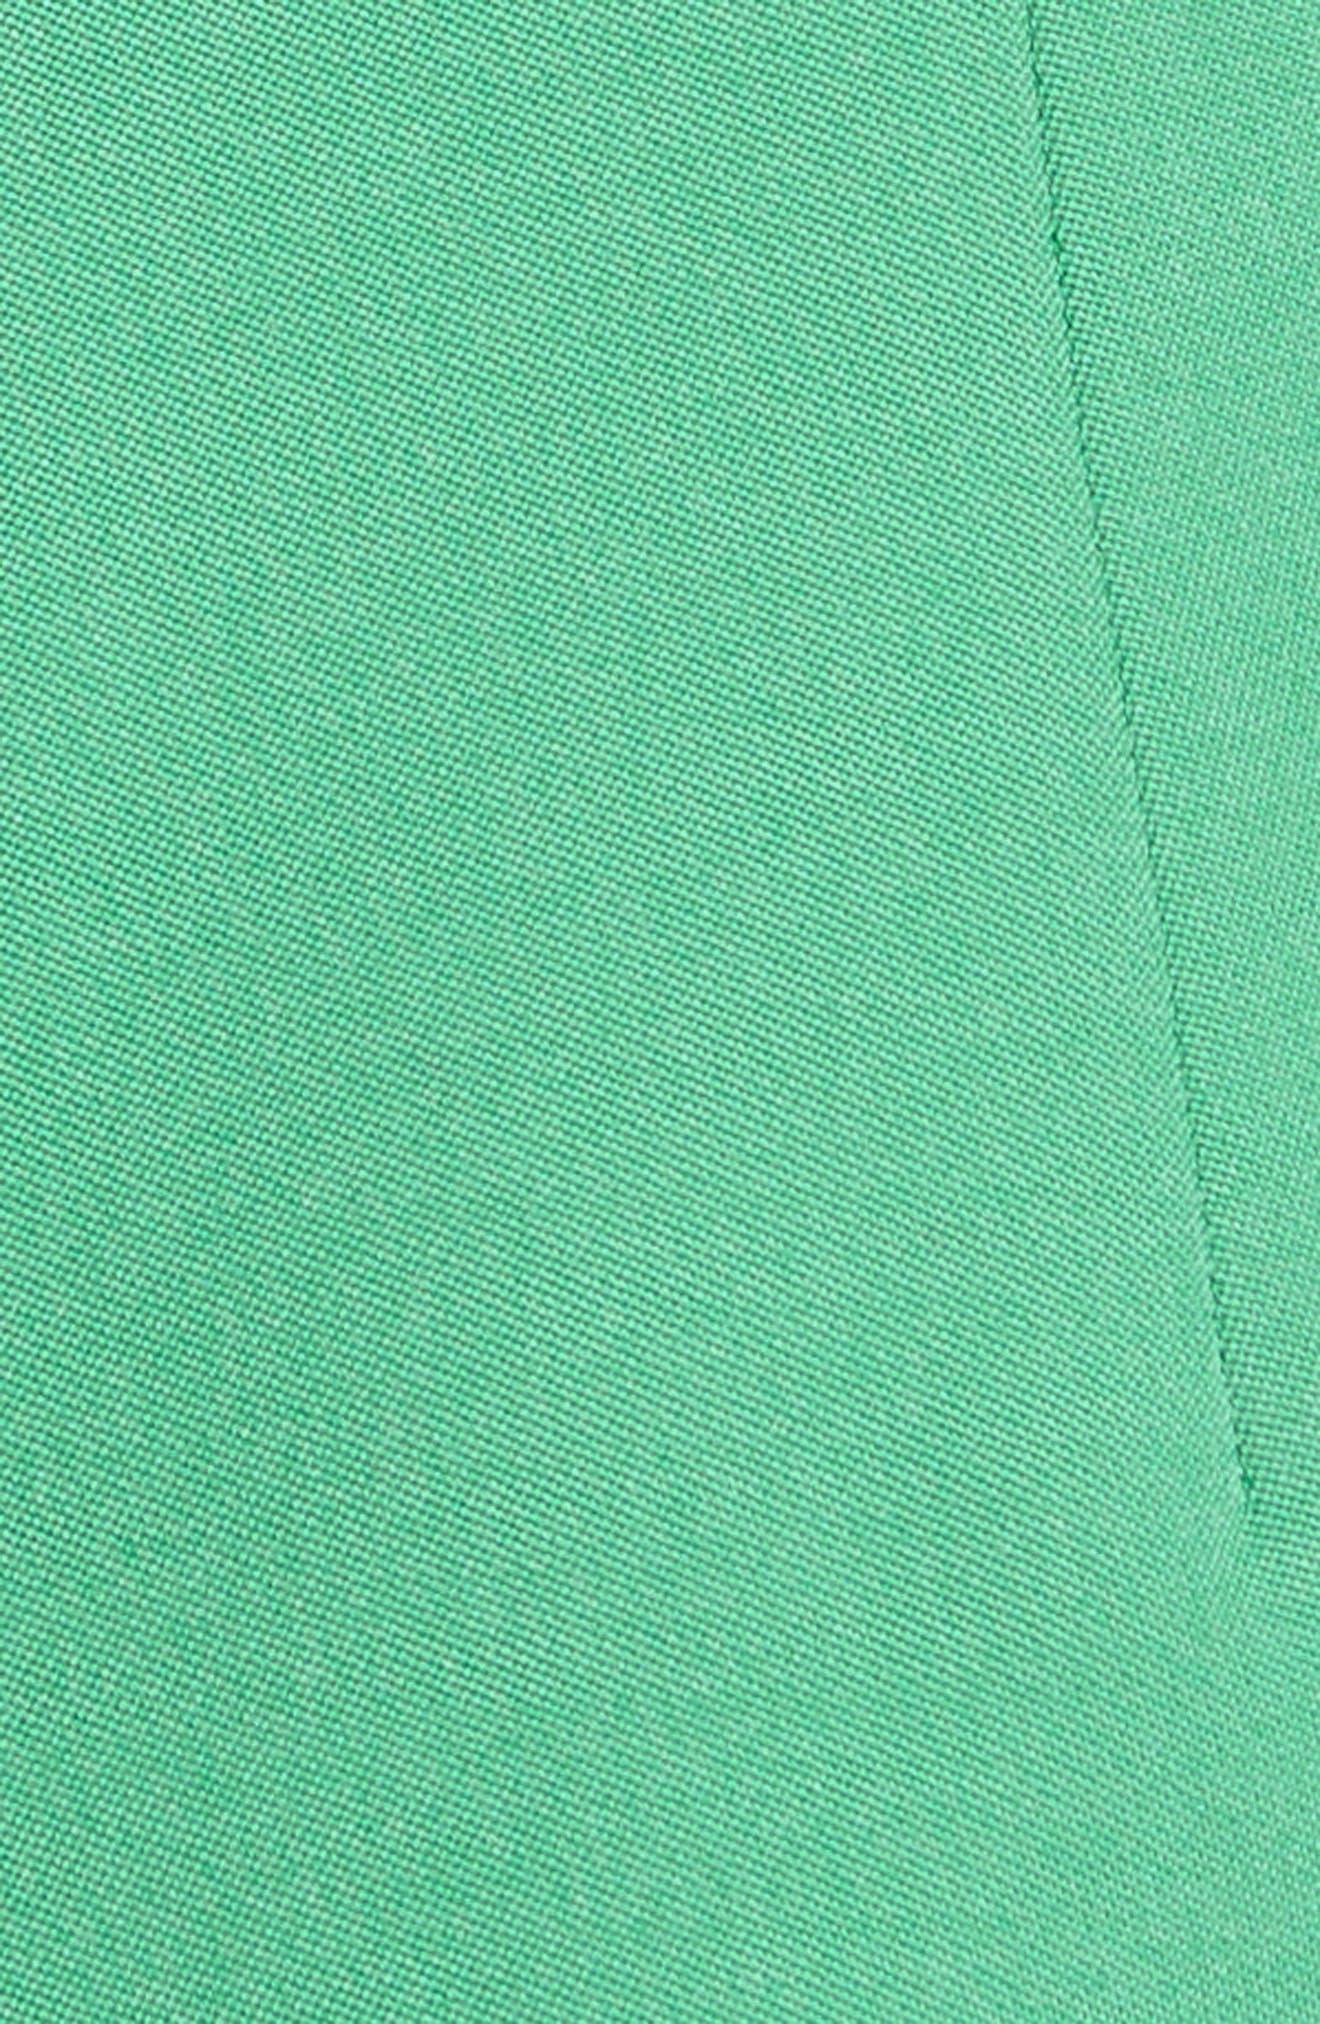 Alternate Image 3  - Carolina Herrera Beaded Stretch Wool Dress